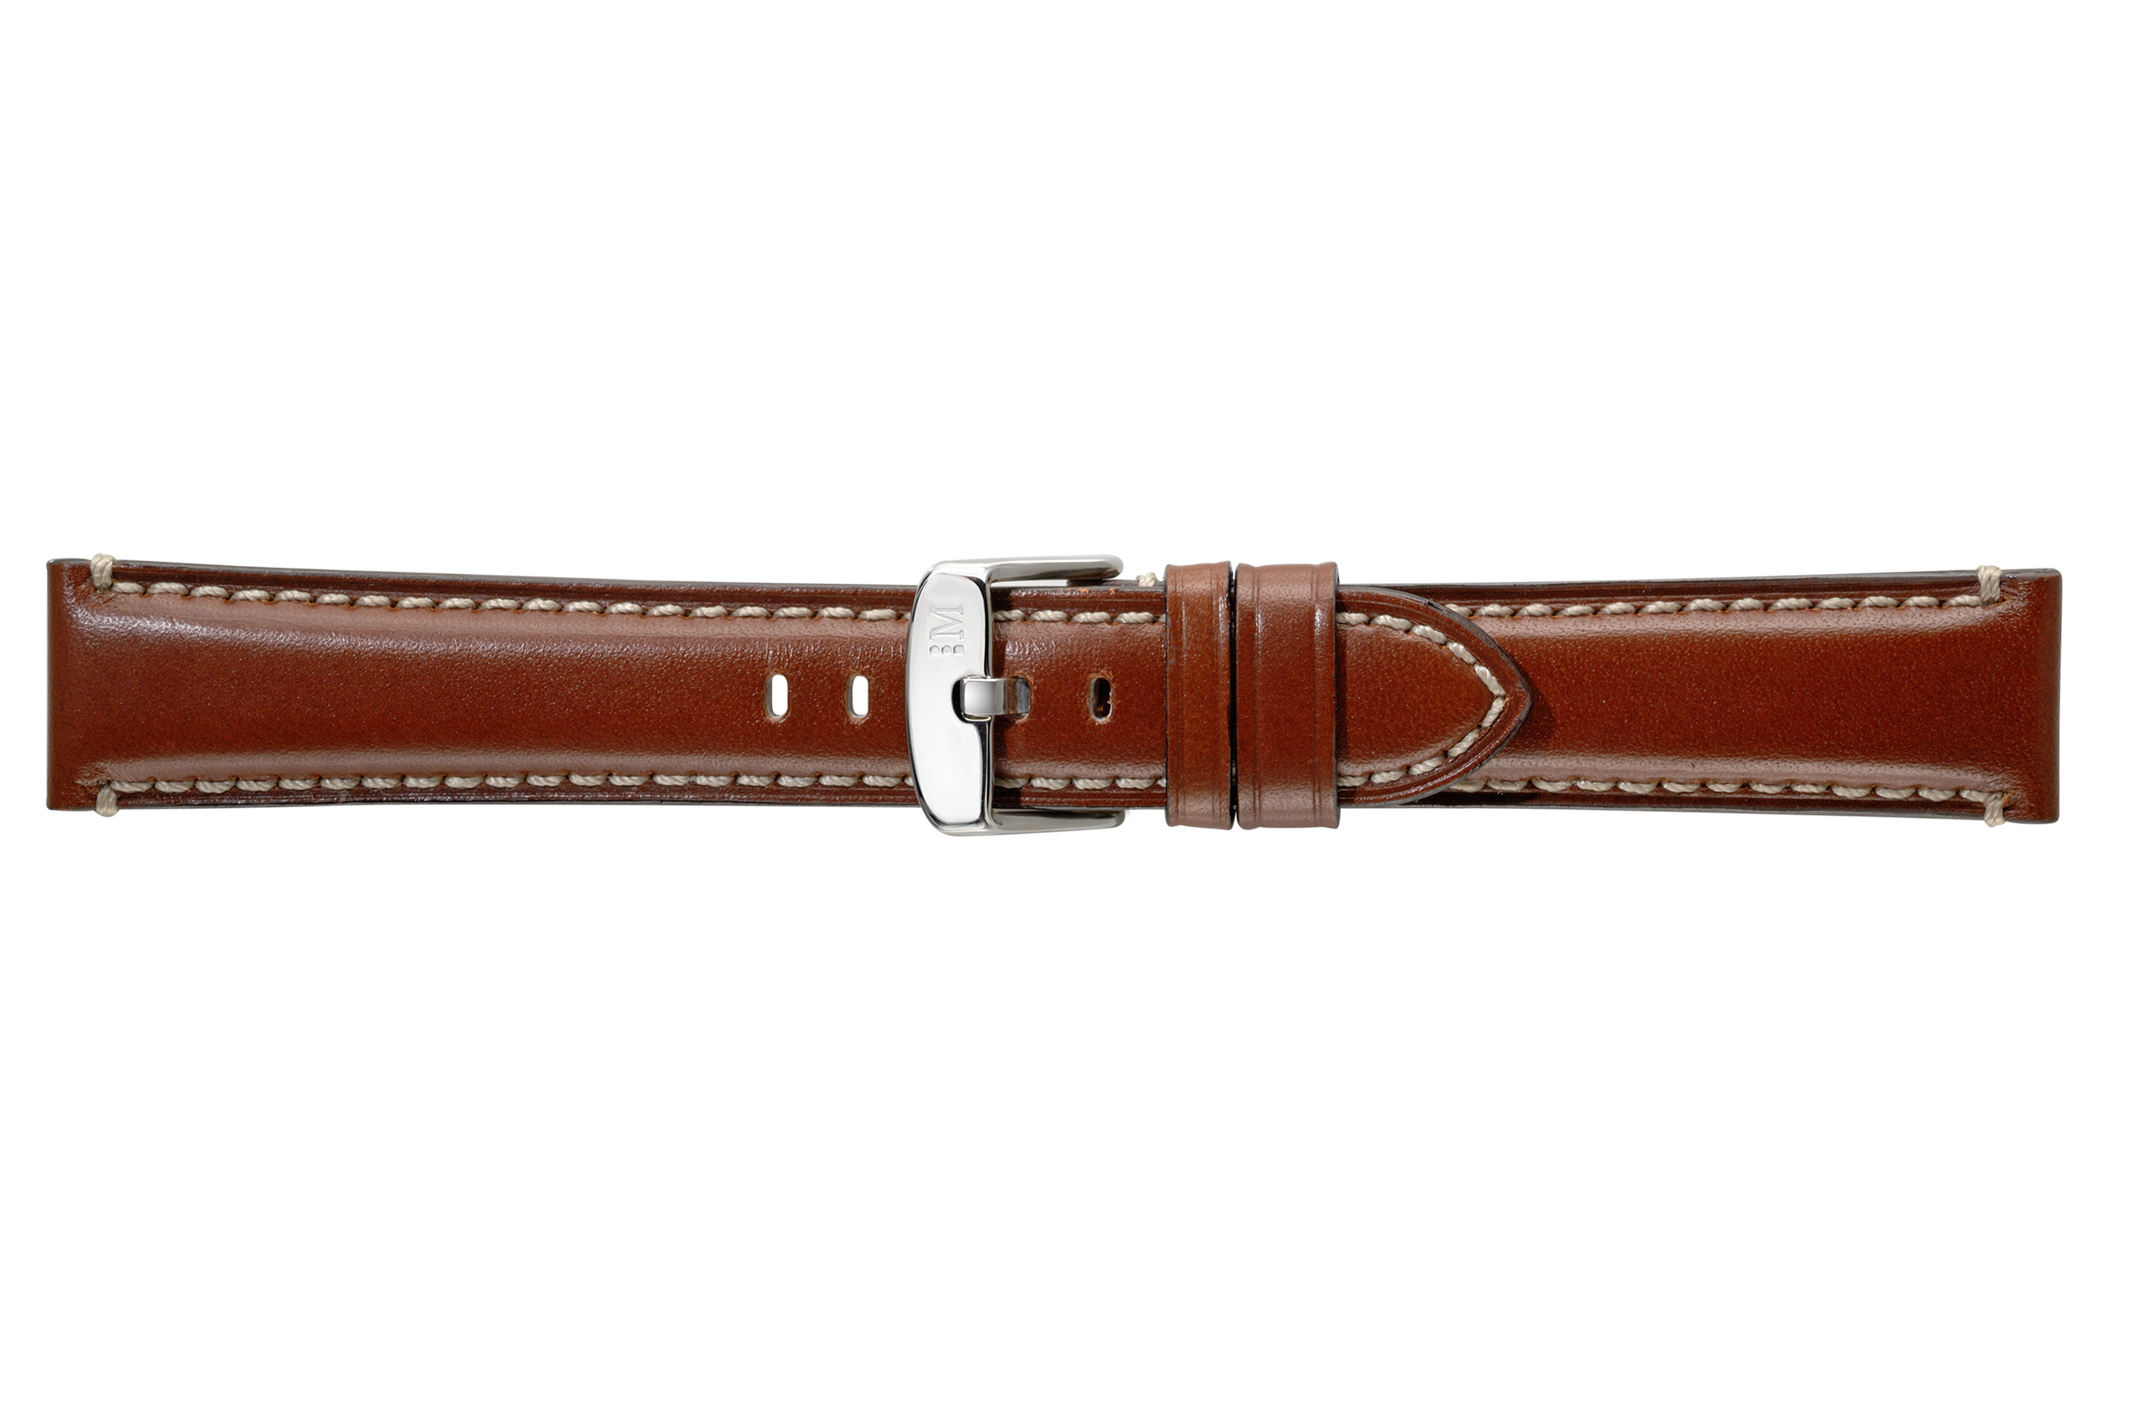 Morellato horlogeband Giorgione X4272B12041CR22 / PMX041GIORGI22 Glad leder Bruin 22mm + wit stiksel